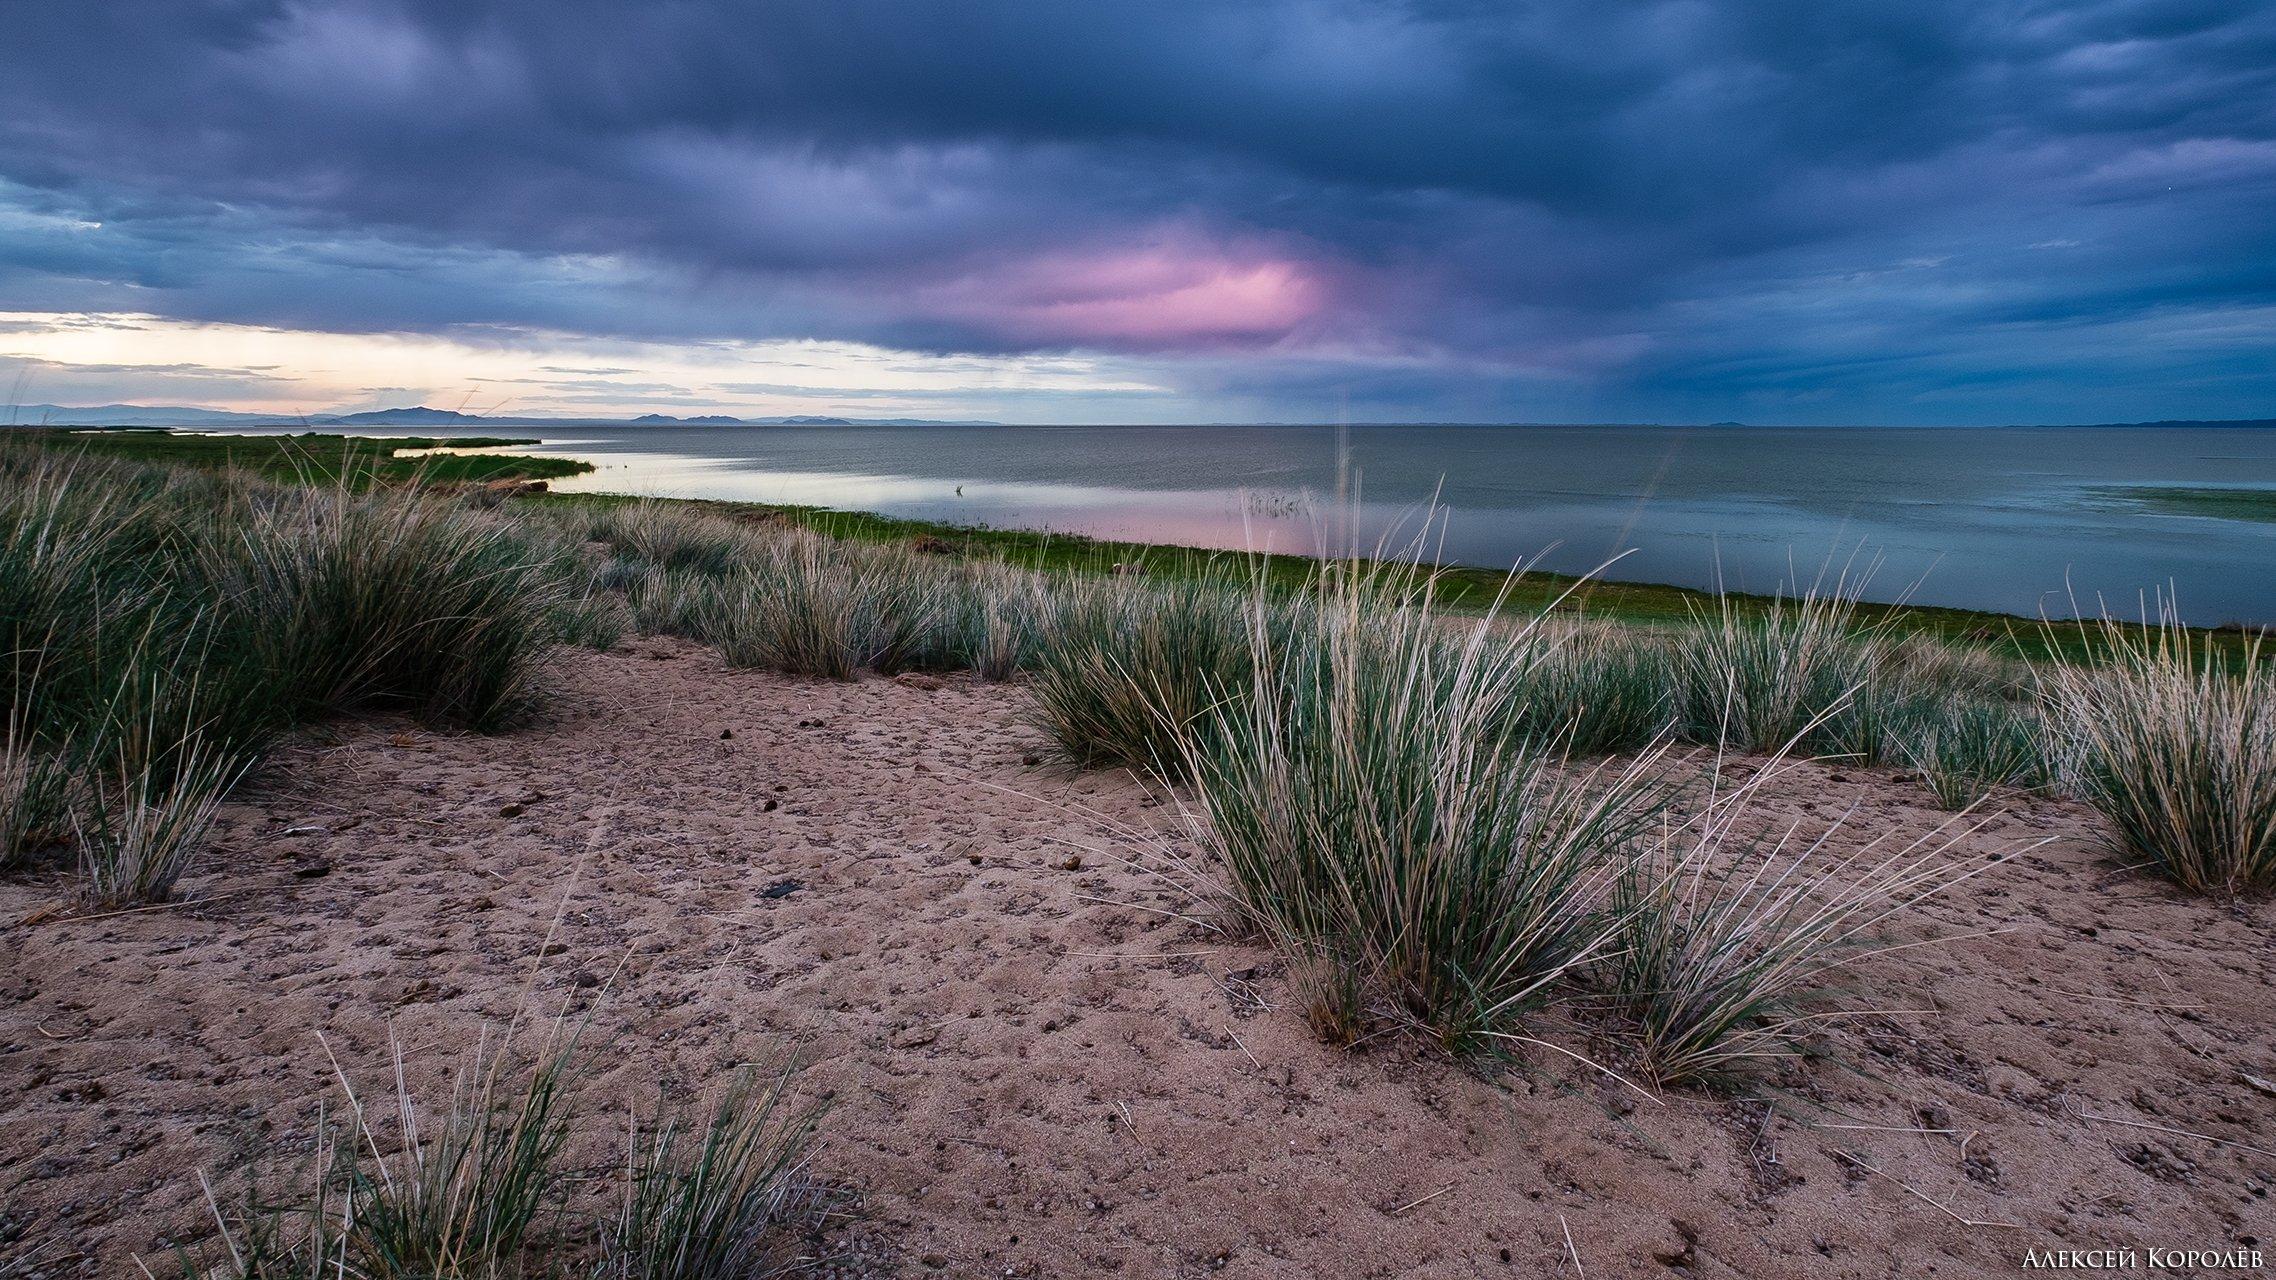 монголия, закат, озеро, песок, ирисы, природа, пейзаж, лето, mongolia, sunset, lake, sand, irises, nature, landscape, summer, Алексей Королёв